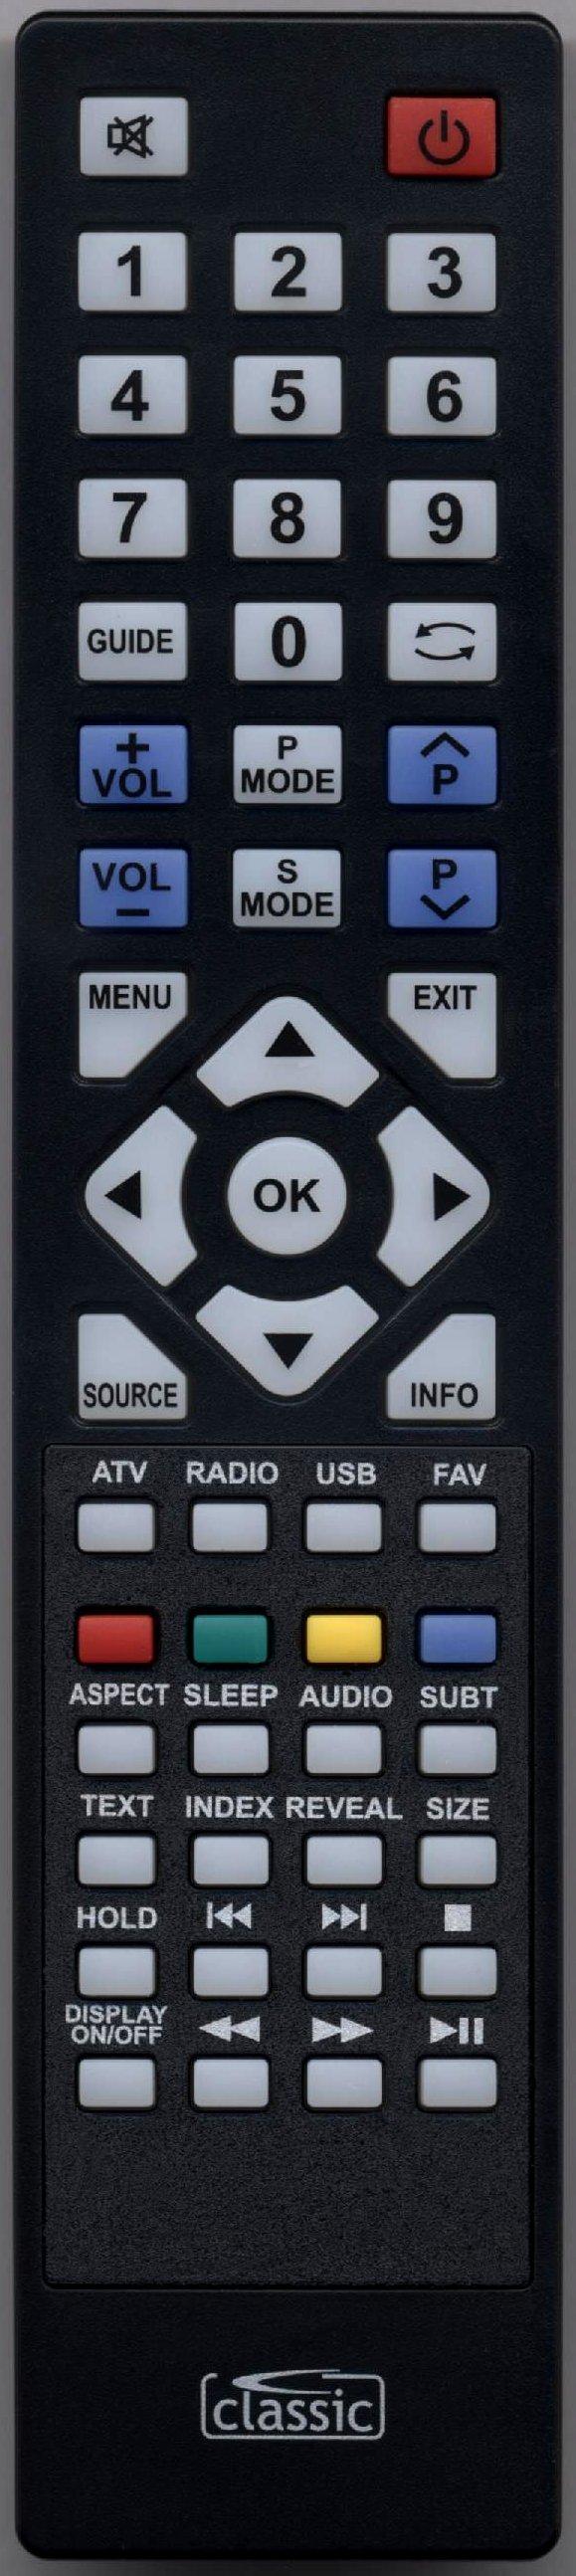 Blaupunkt X3256GGBTCUUK Remote Control Alternative